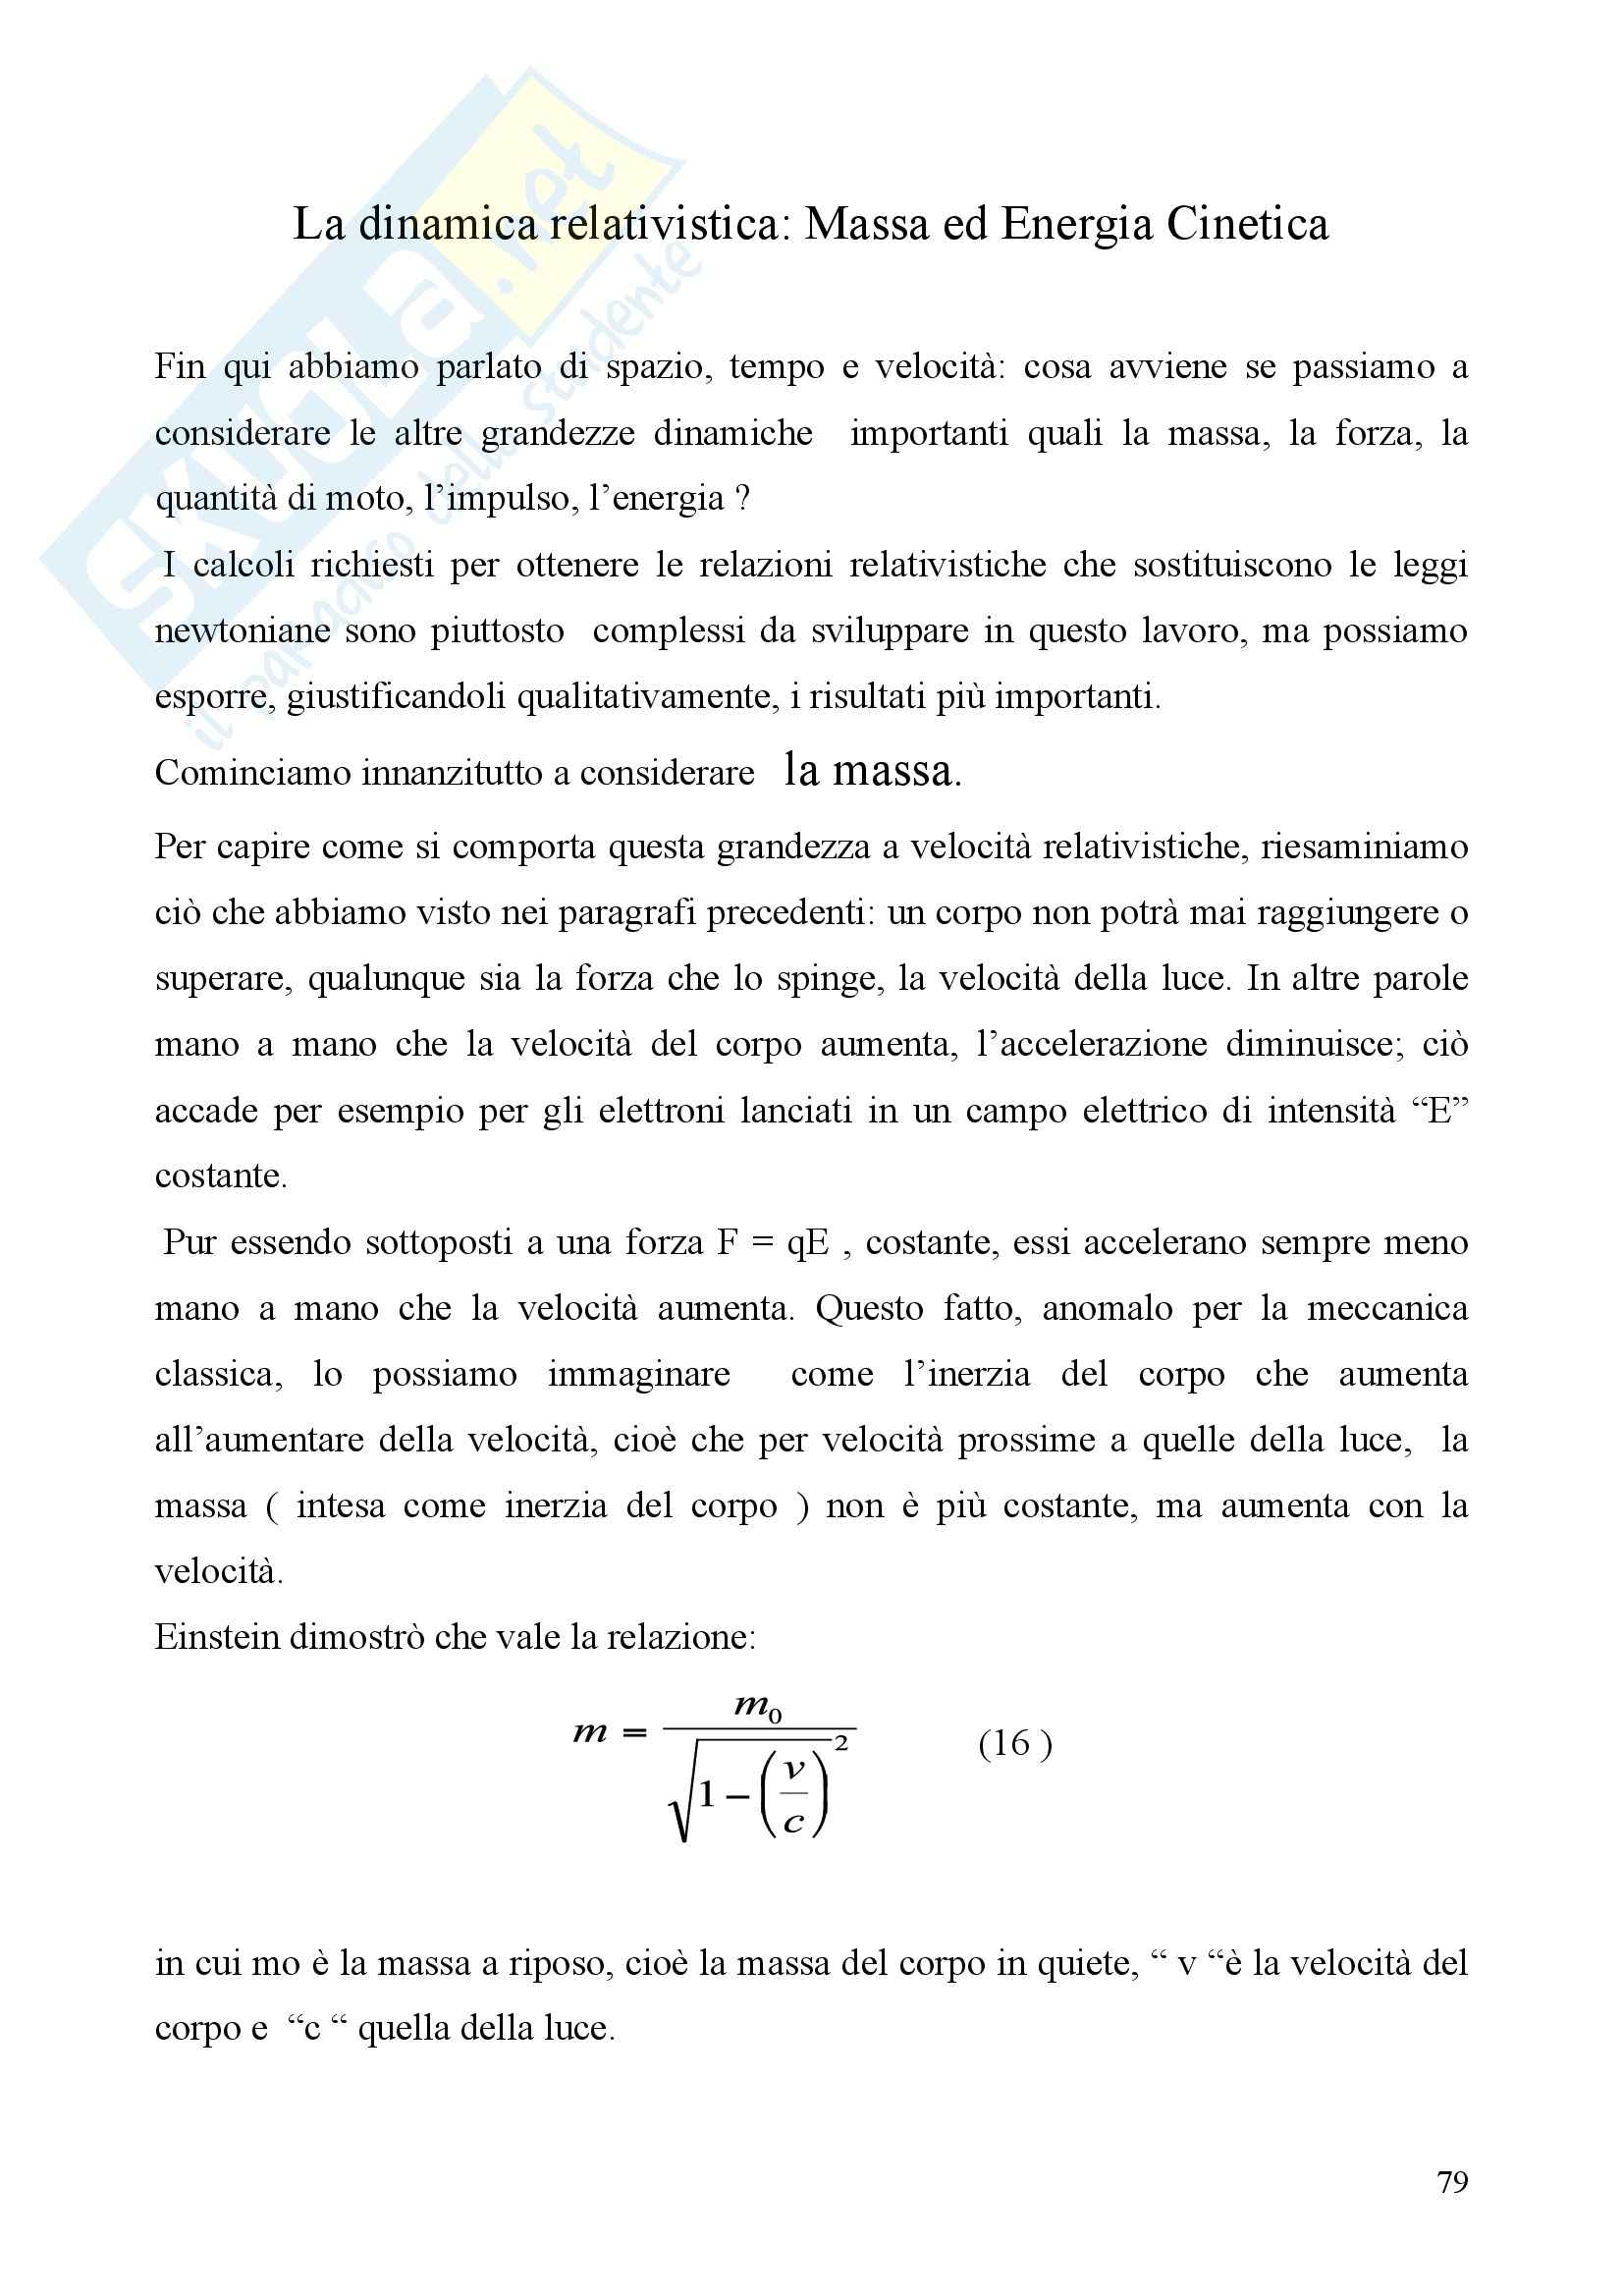 Dinamica relativistica - massa ed energia cinetica